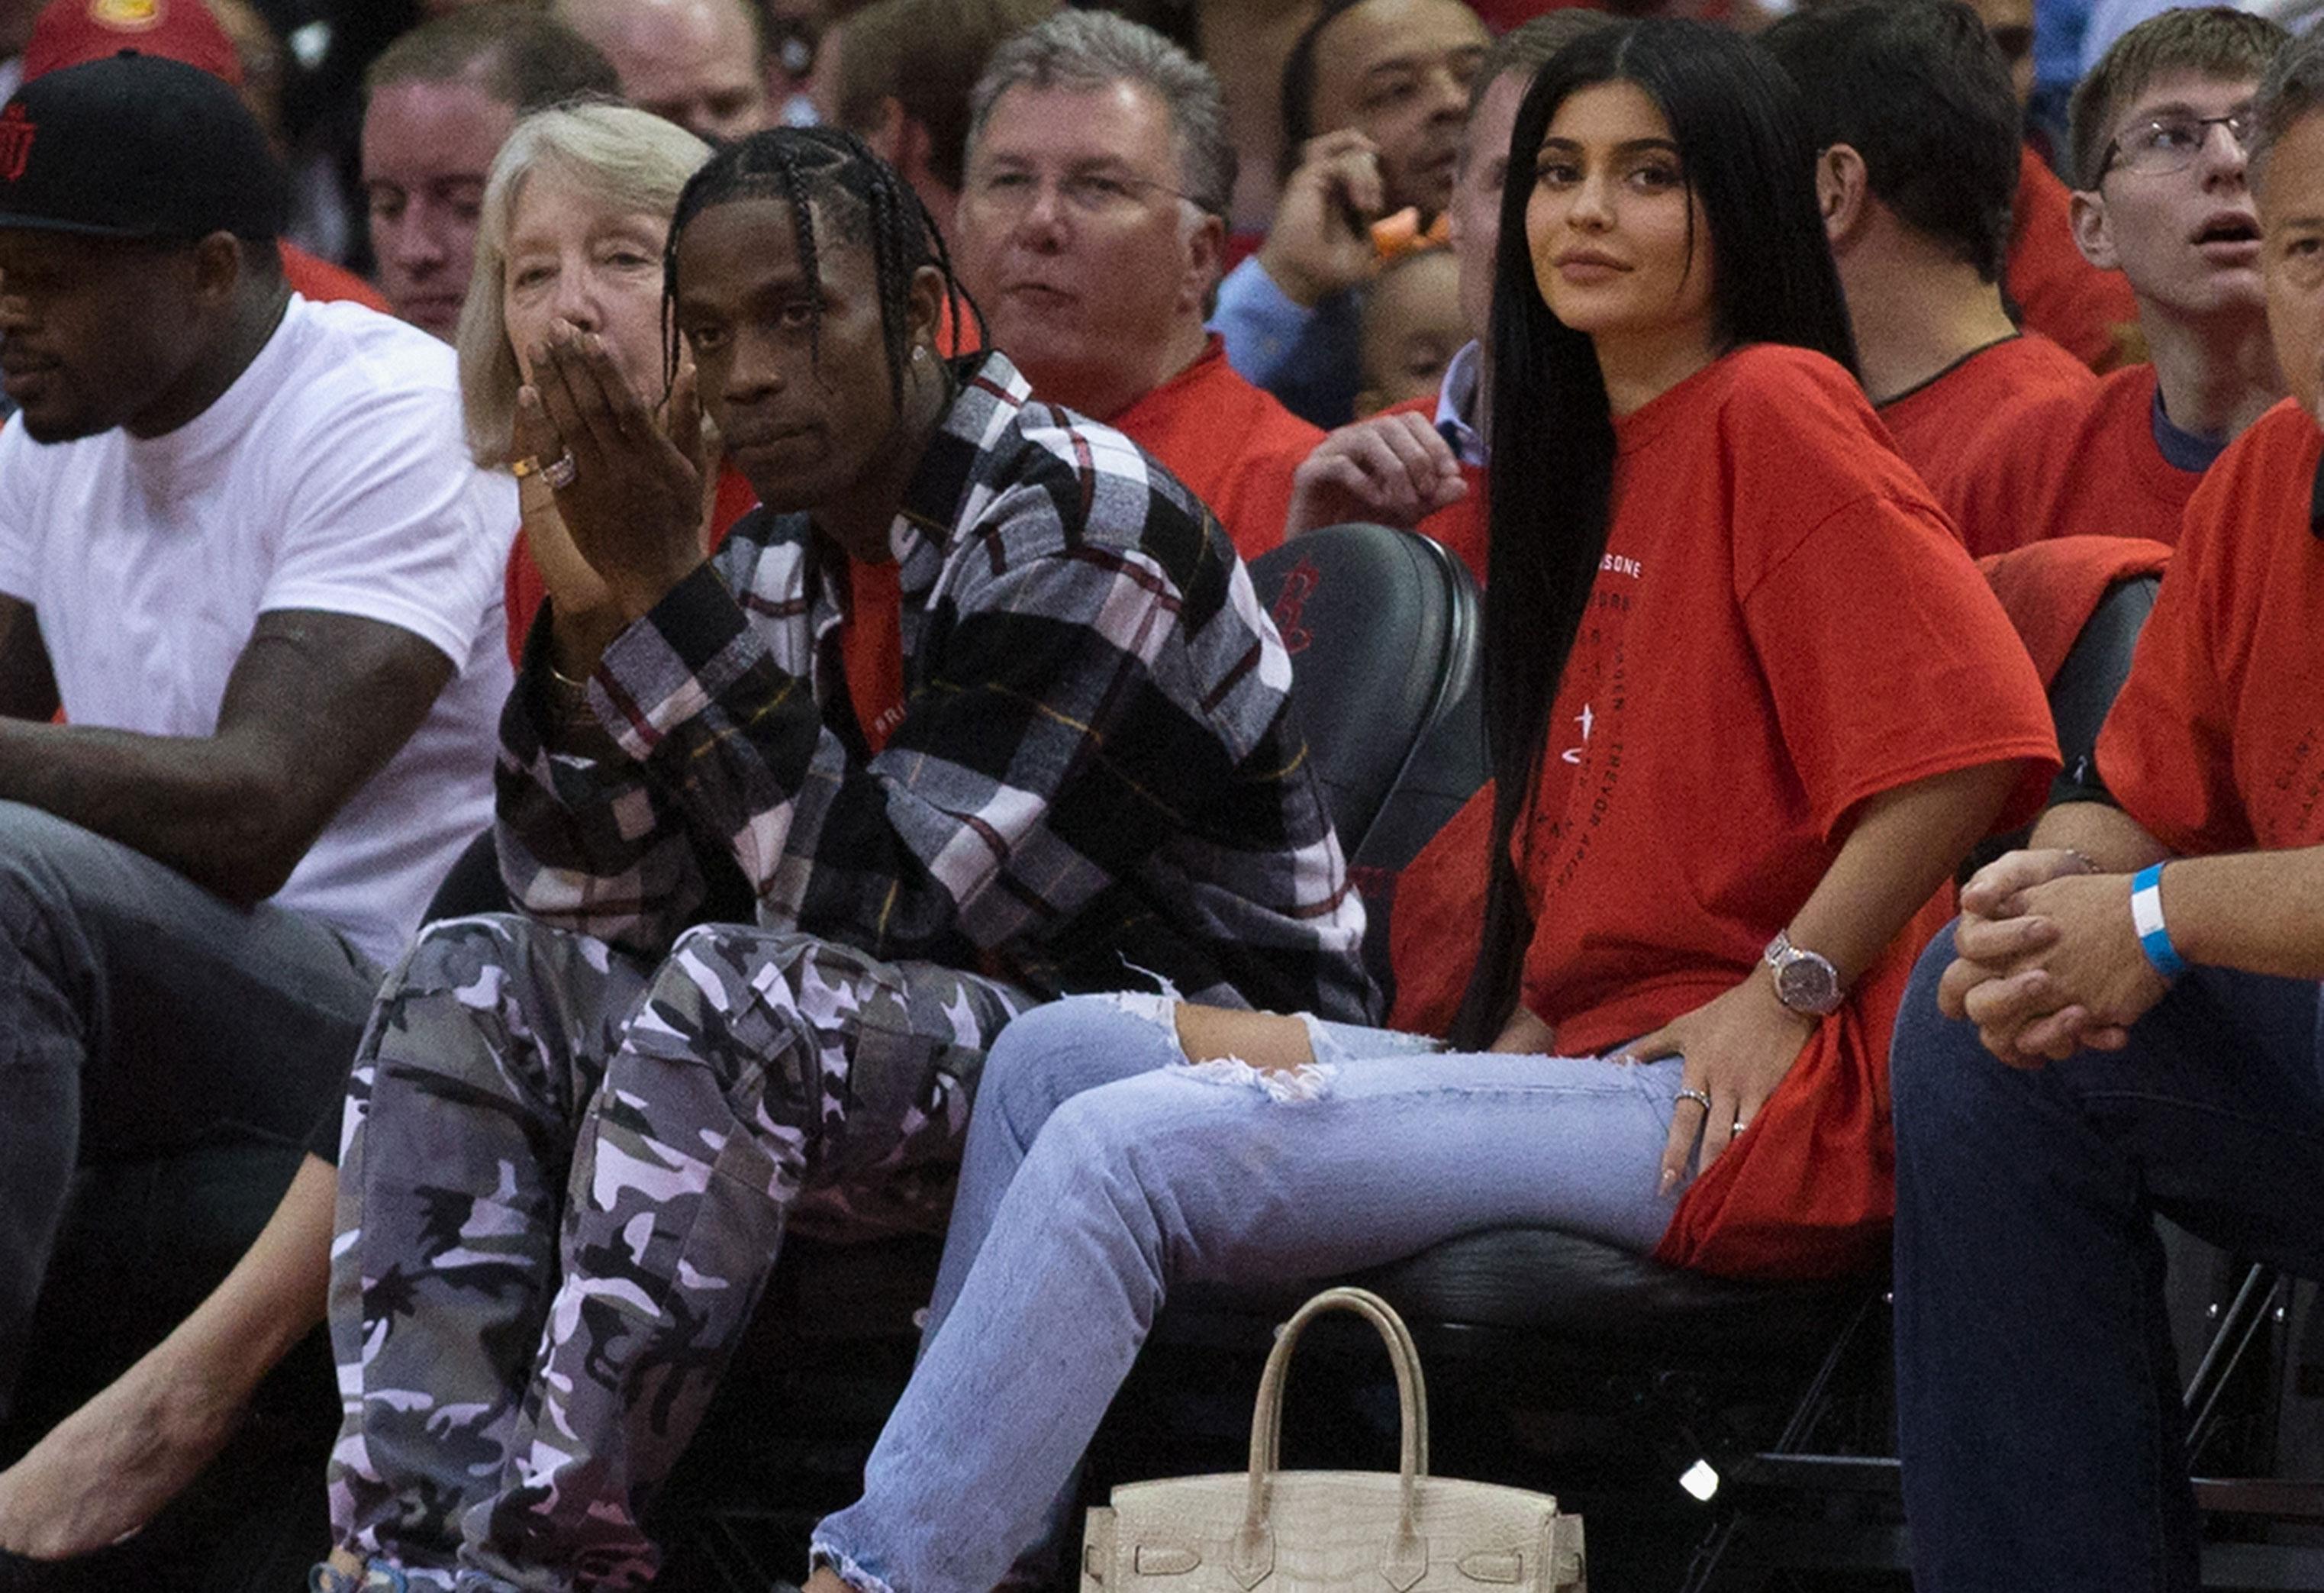 Kylie Jenner travis scott pp